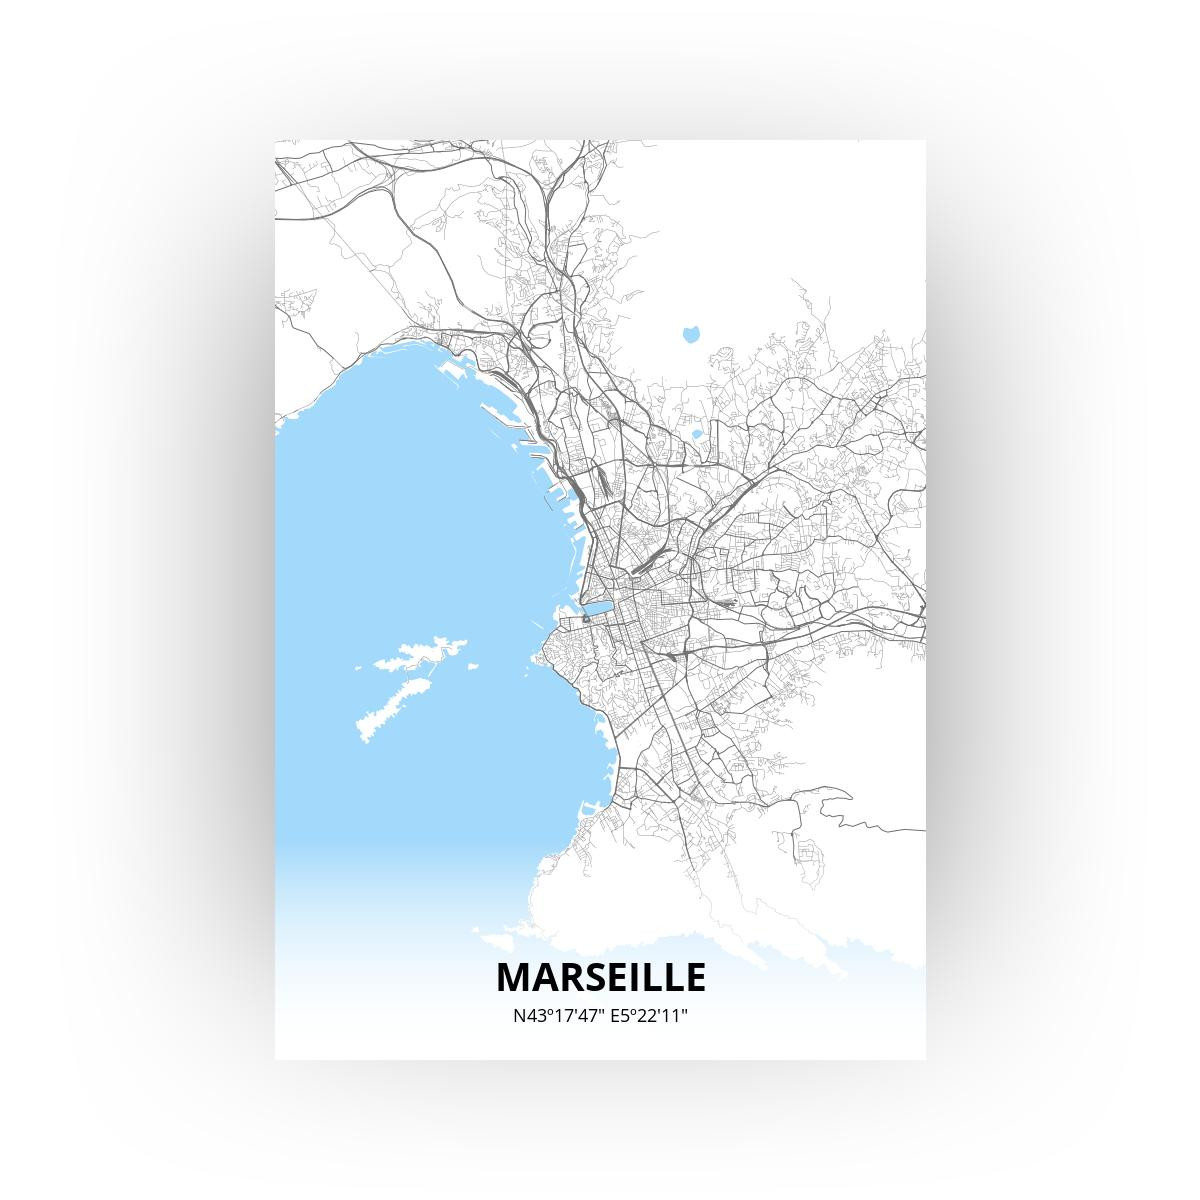 Marseille print - Standaard stijl